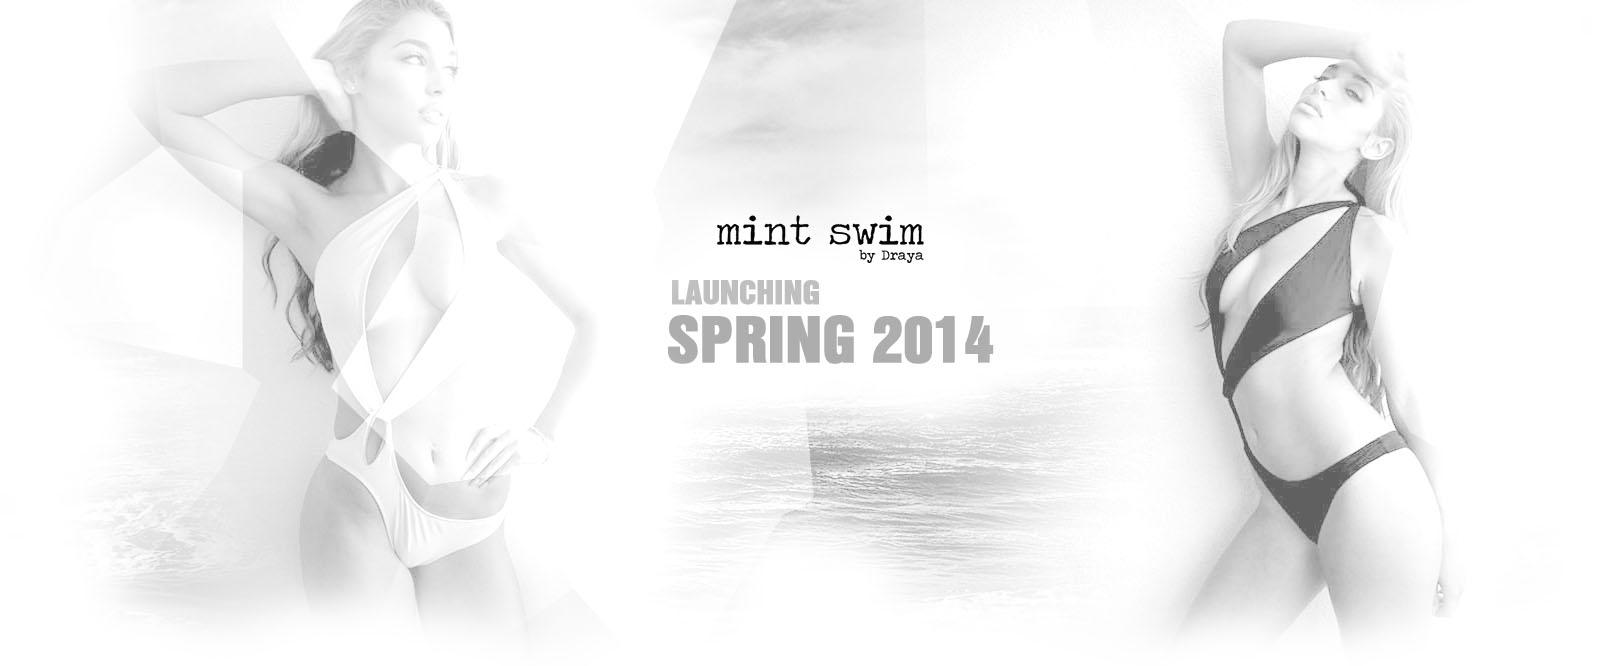 Mint Swim